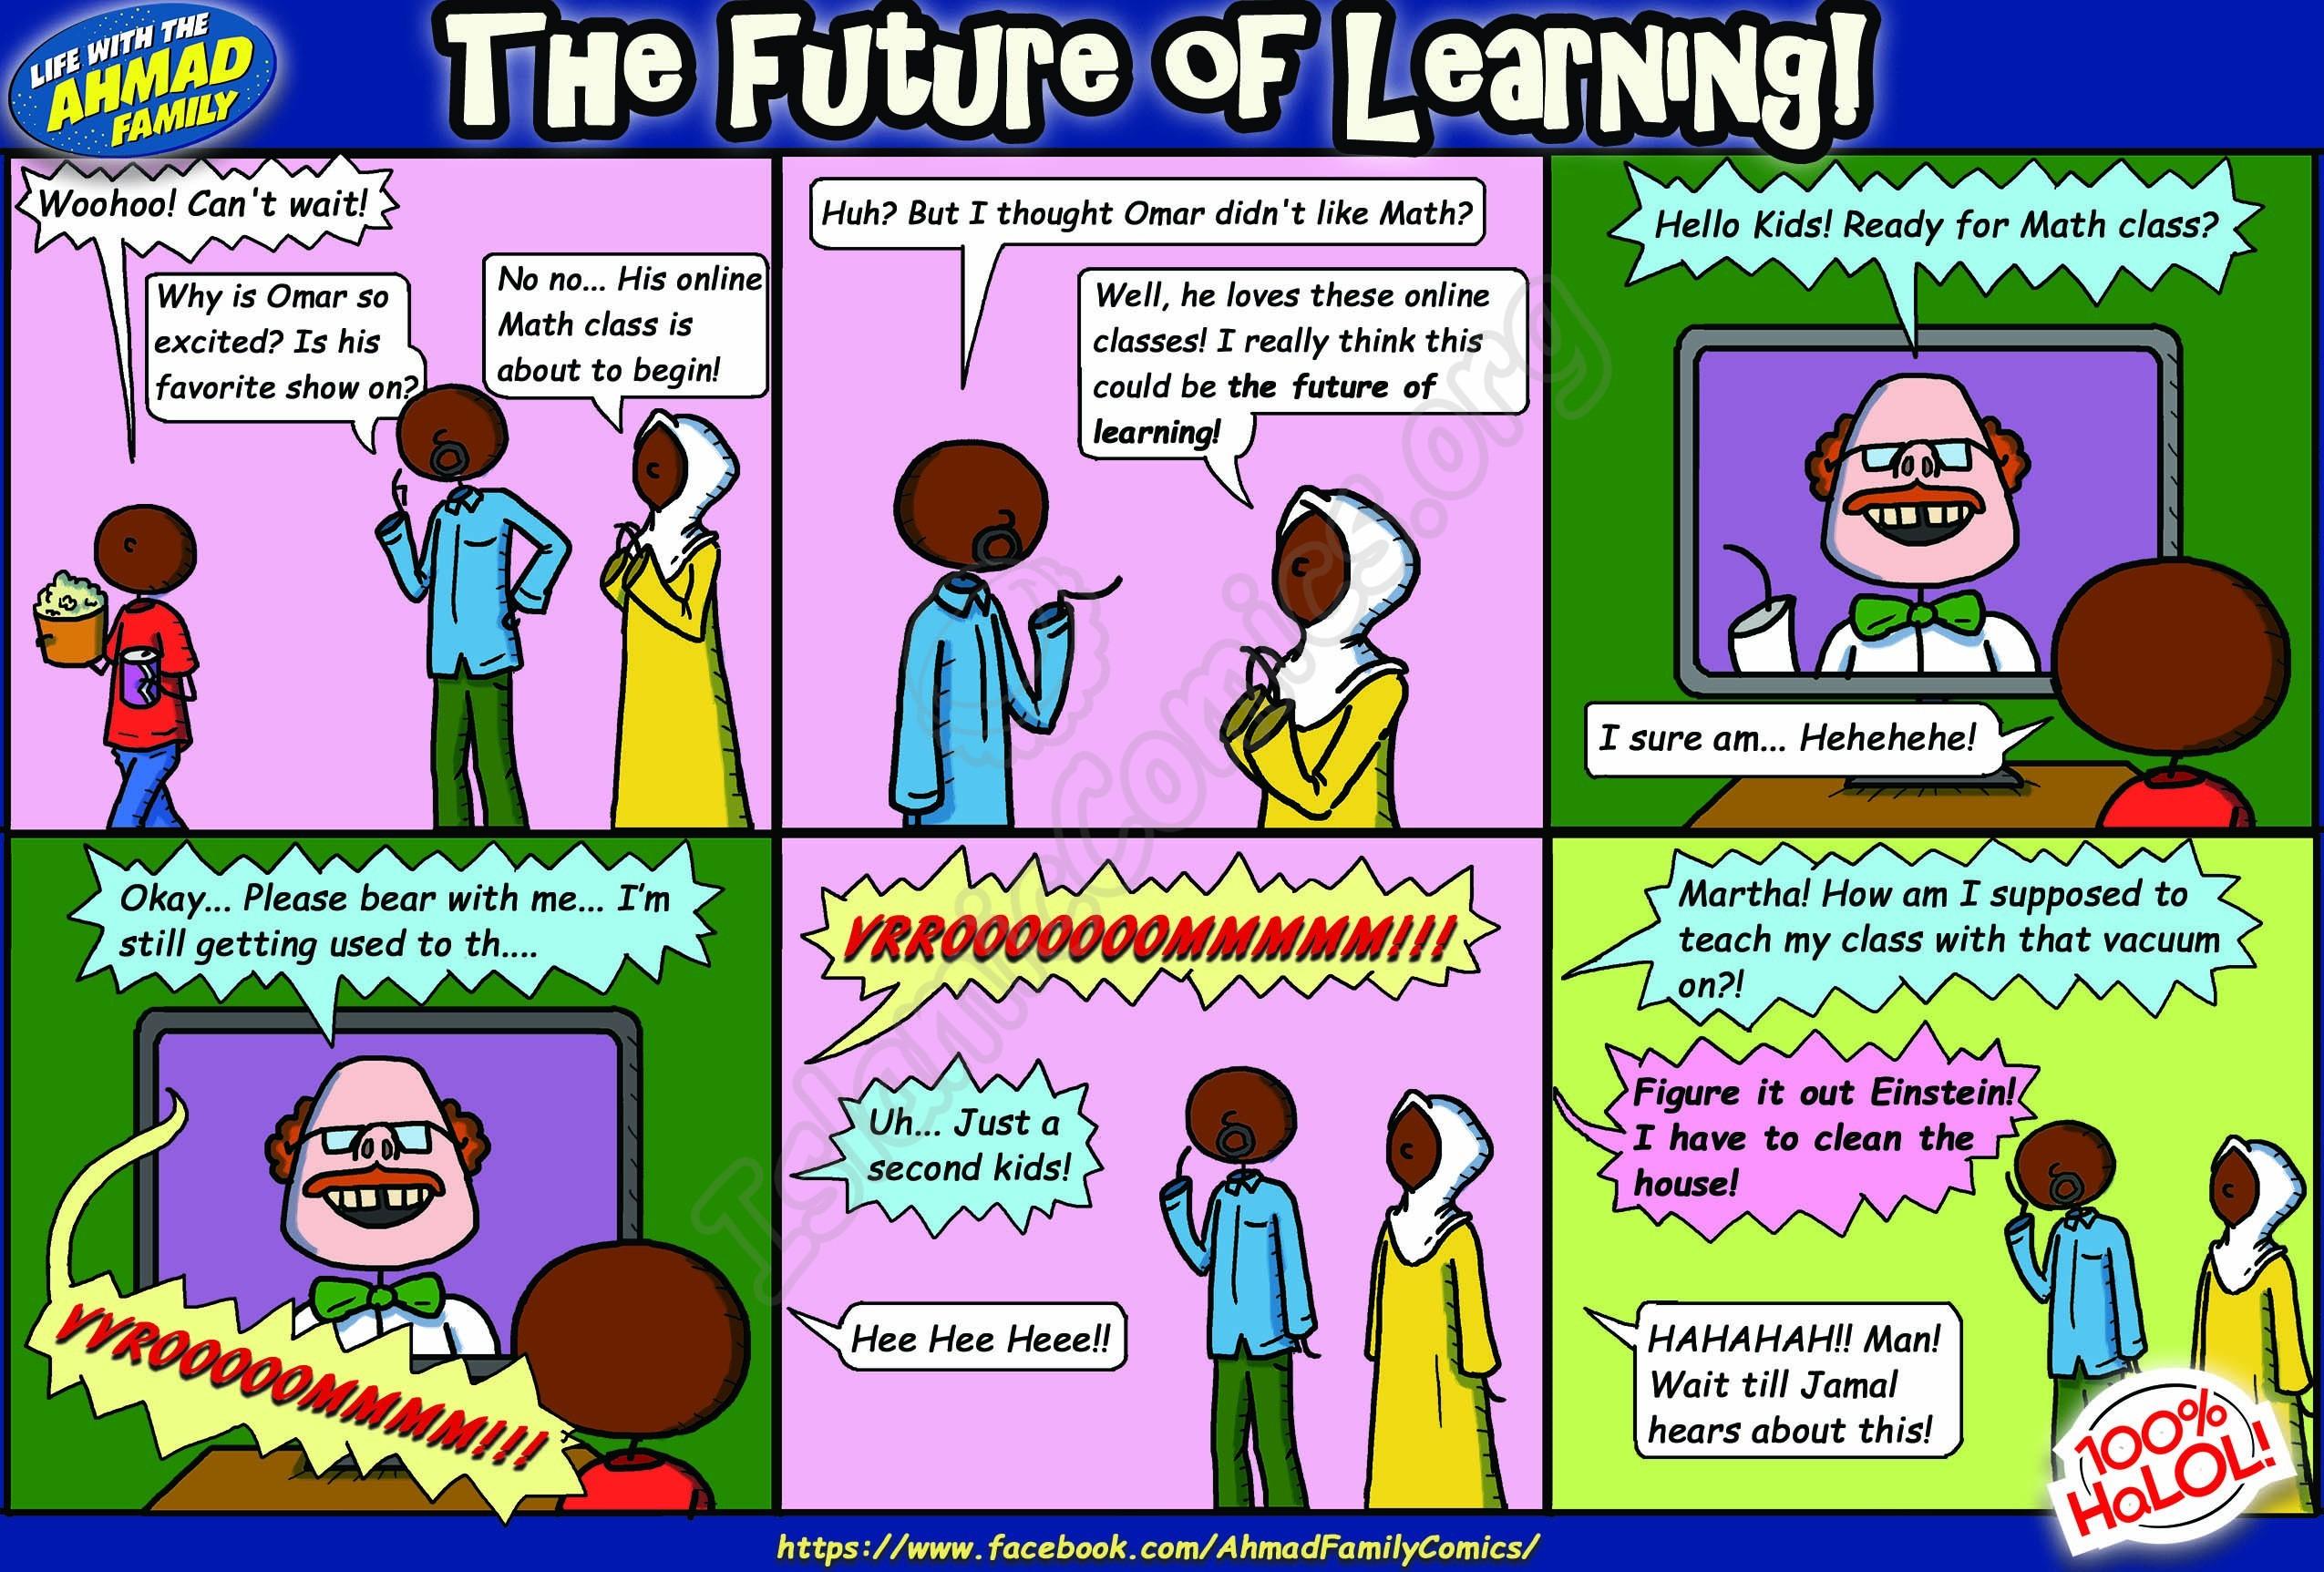 The Future of Learning - Ahmad Family Comics